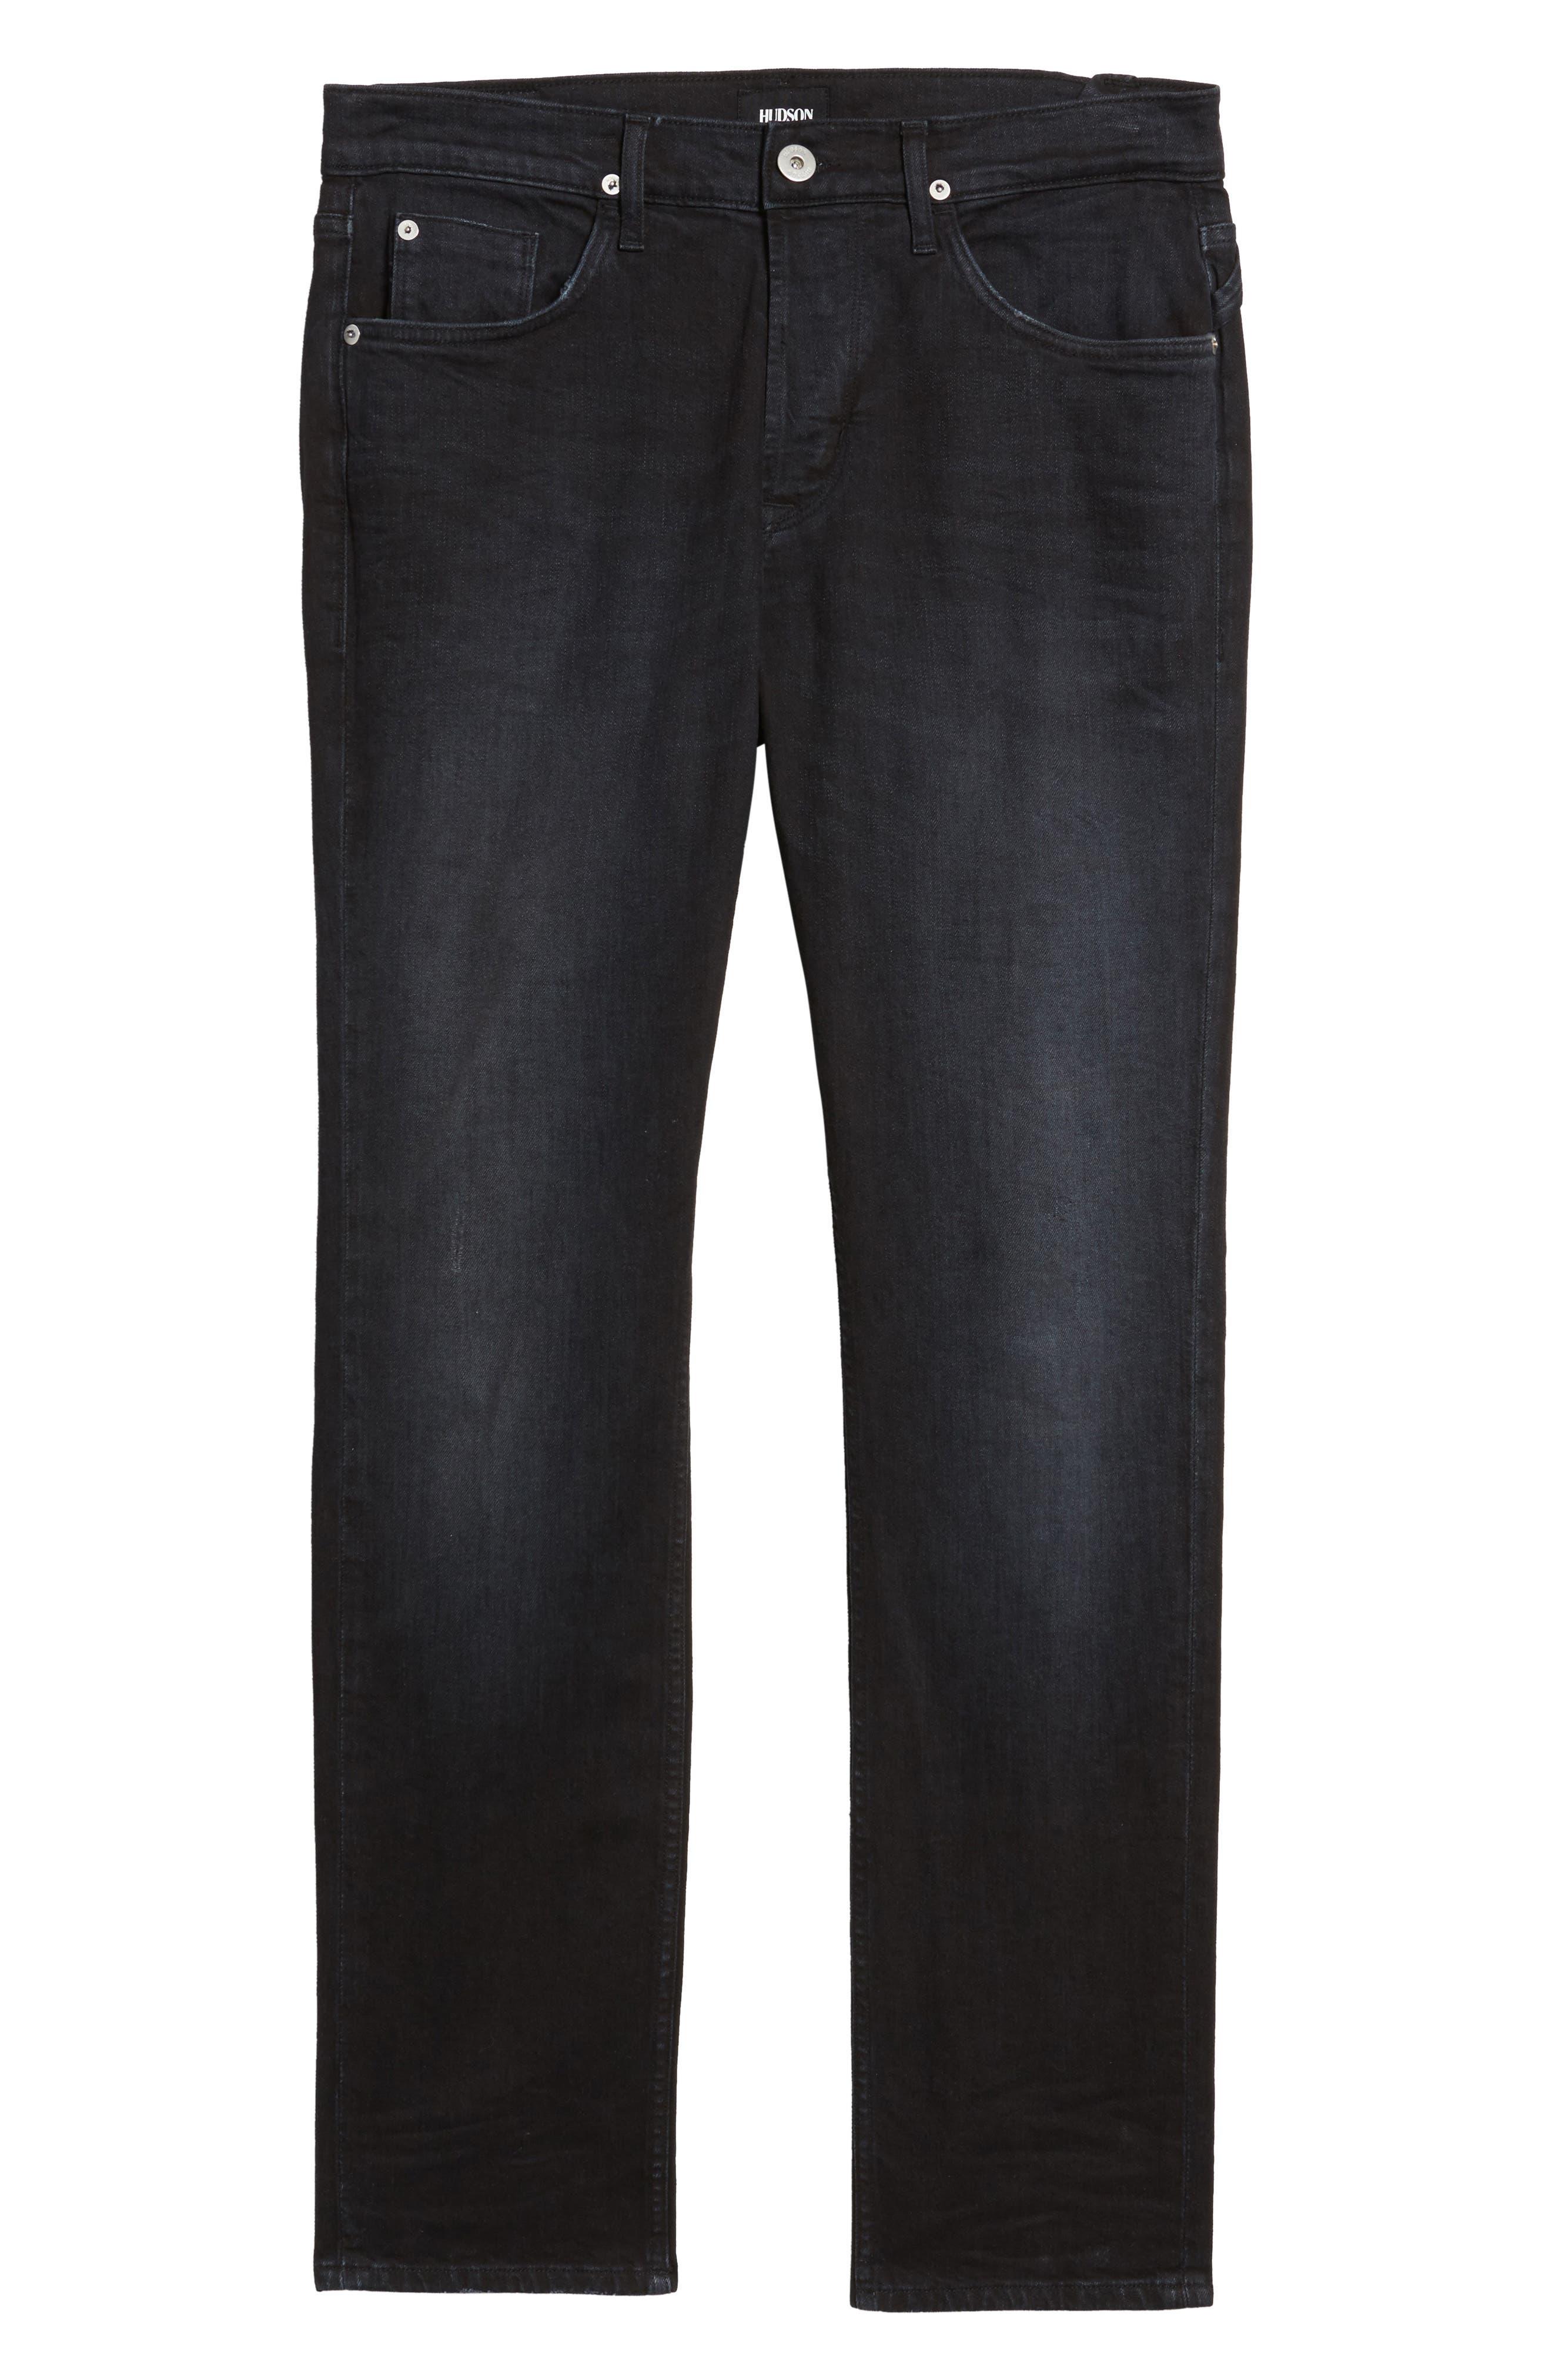 Sartor Skinny Fit Jeans,                             Alternate thumbnail 6, color,                             Low Key